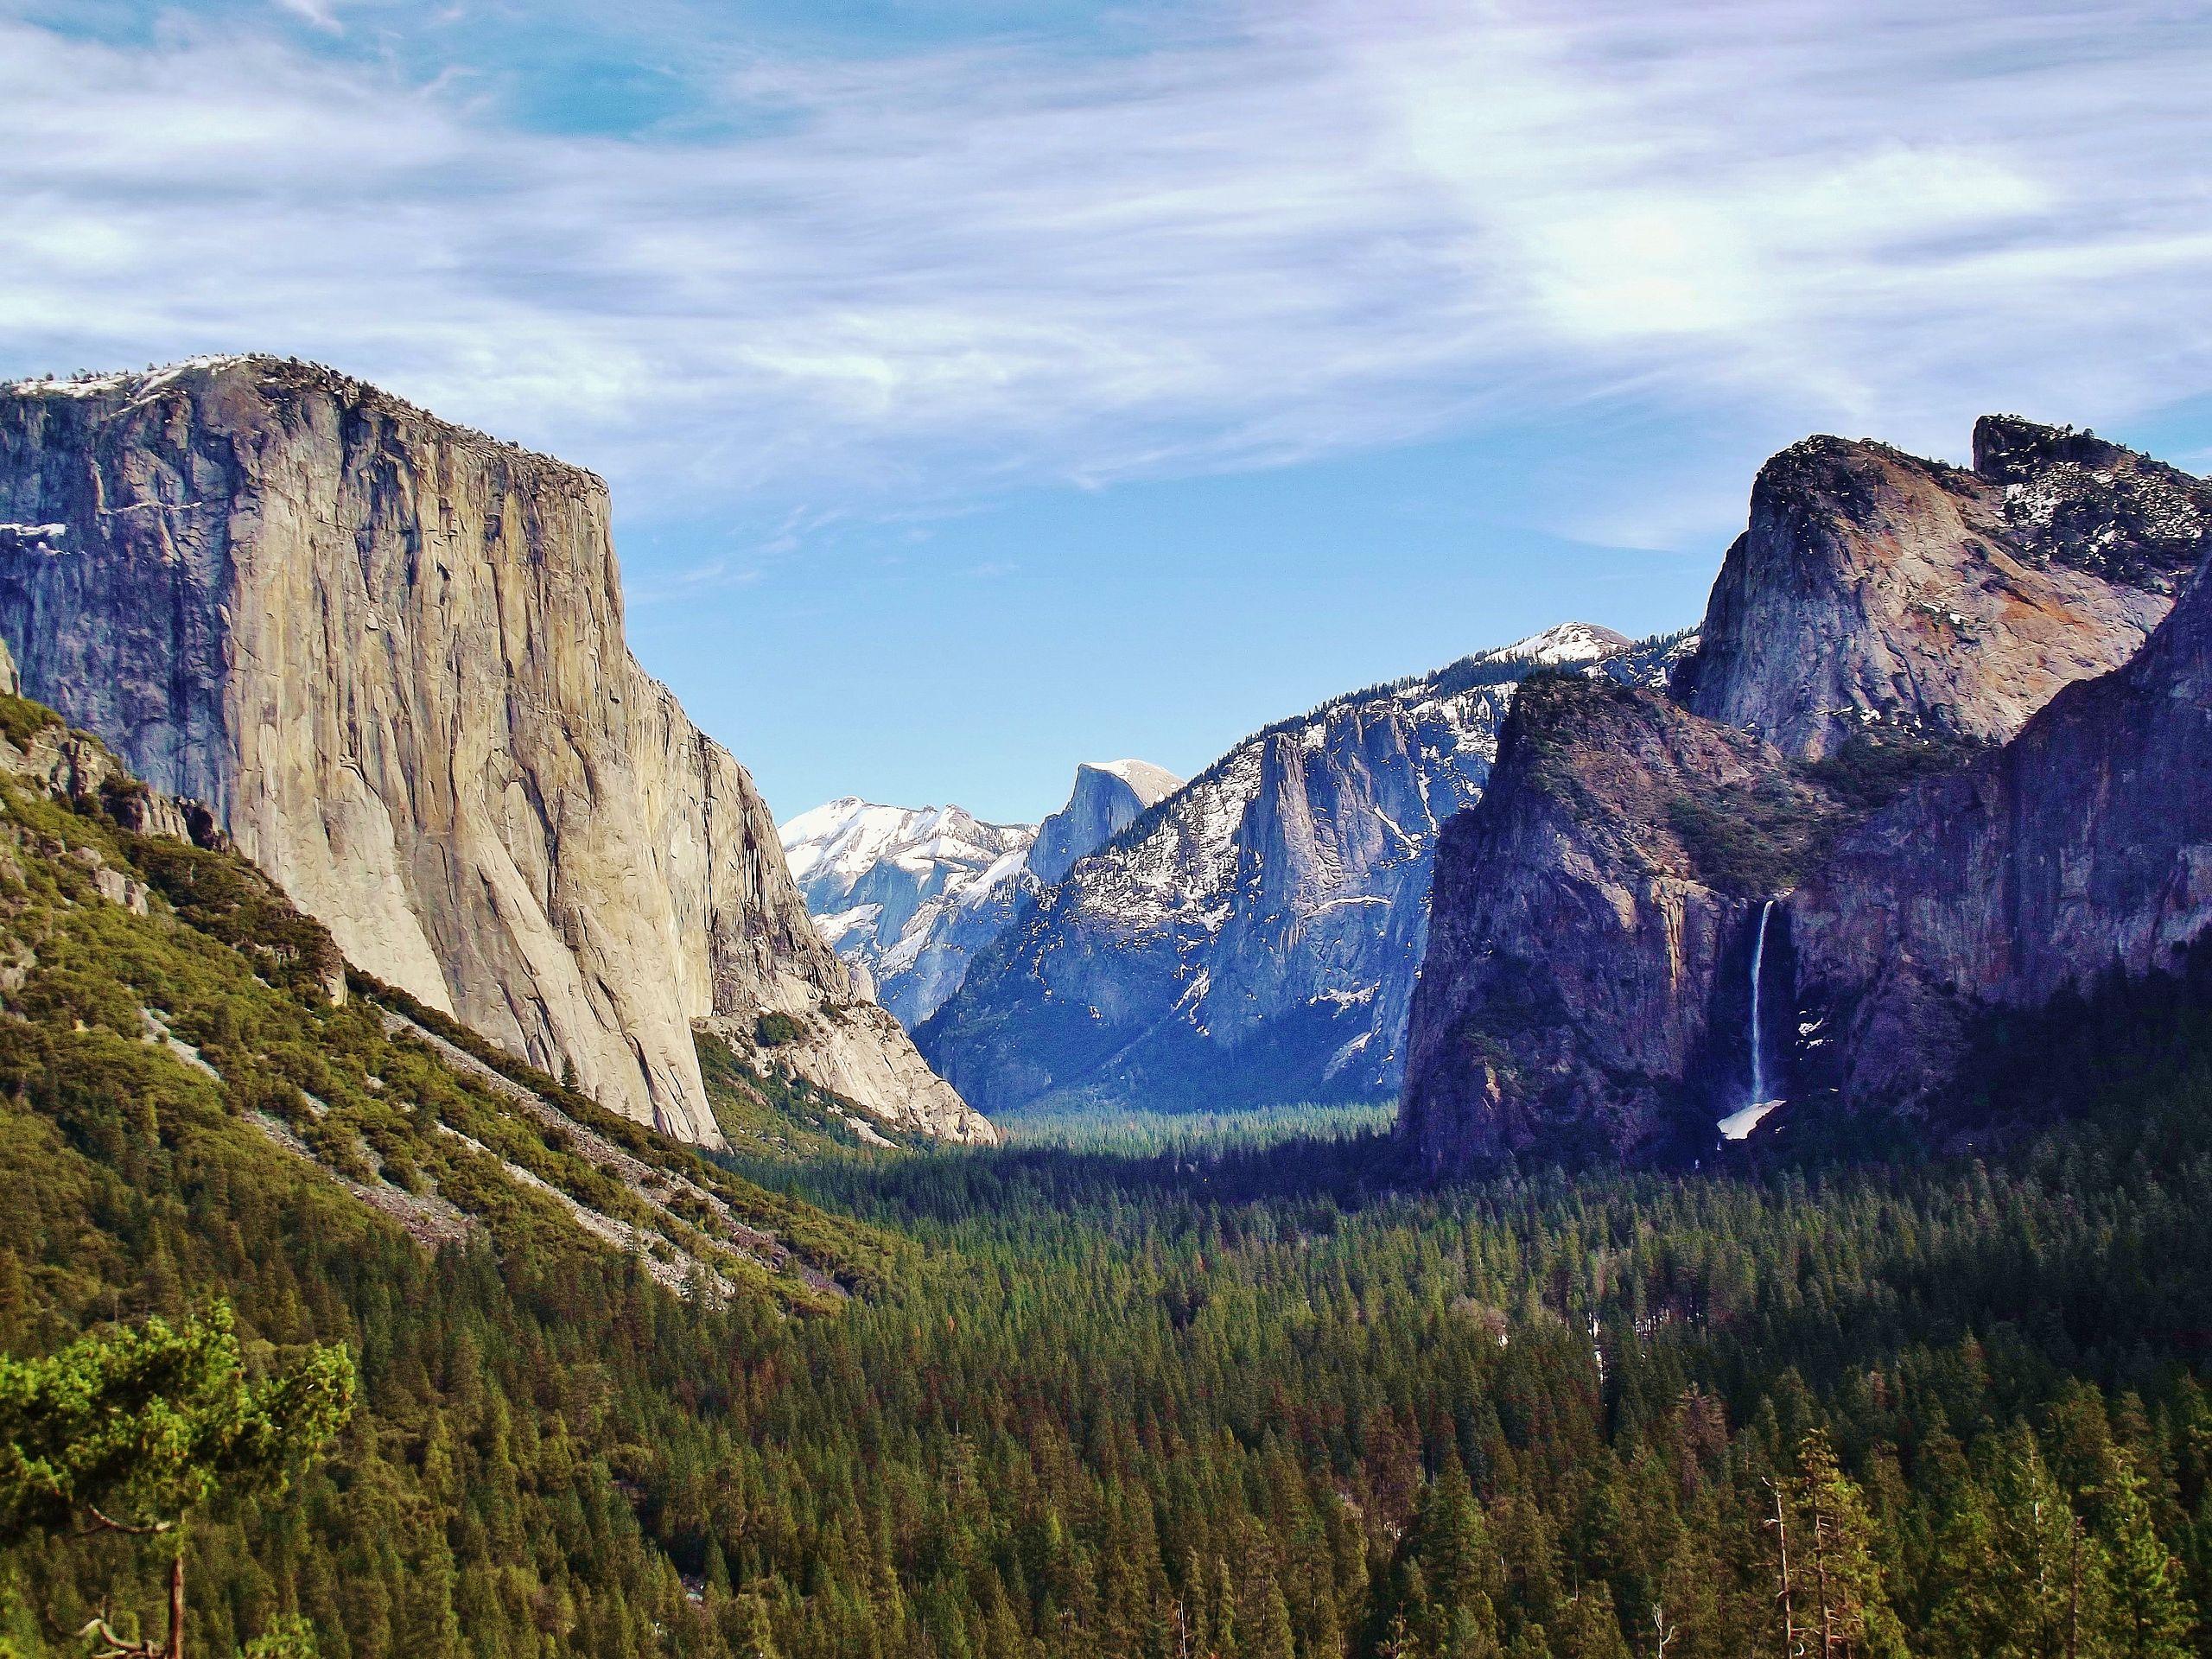 Yosemite Valley from Wawona Tunnel view, vista point..JPG